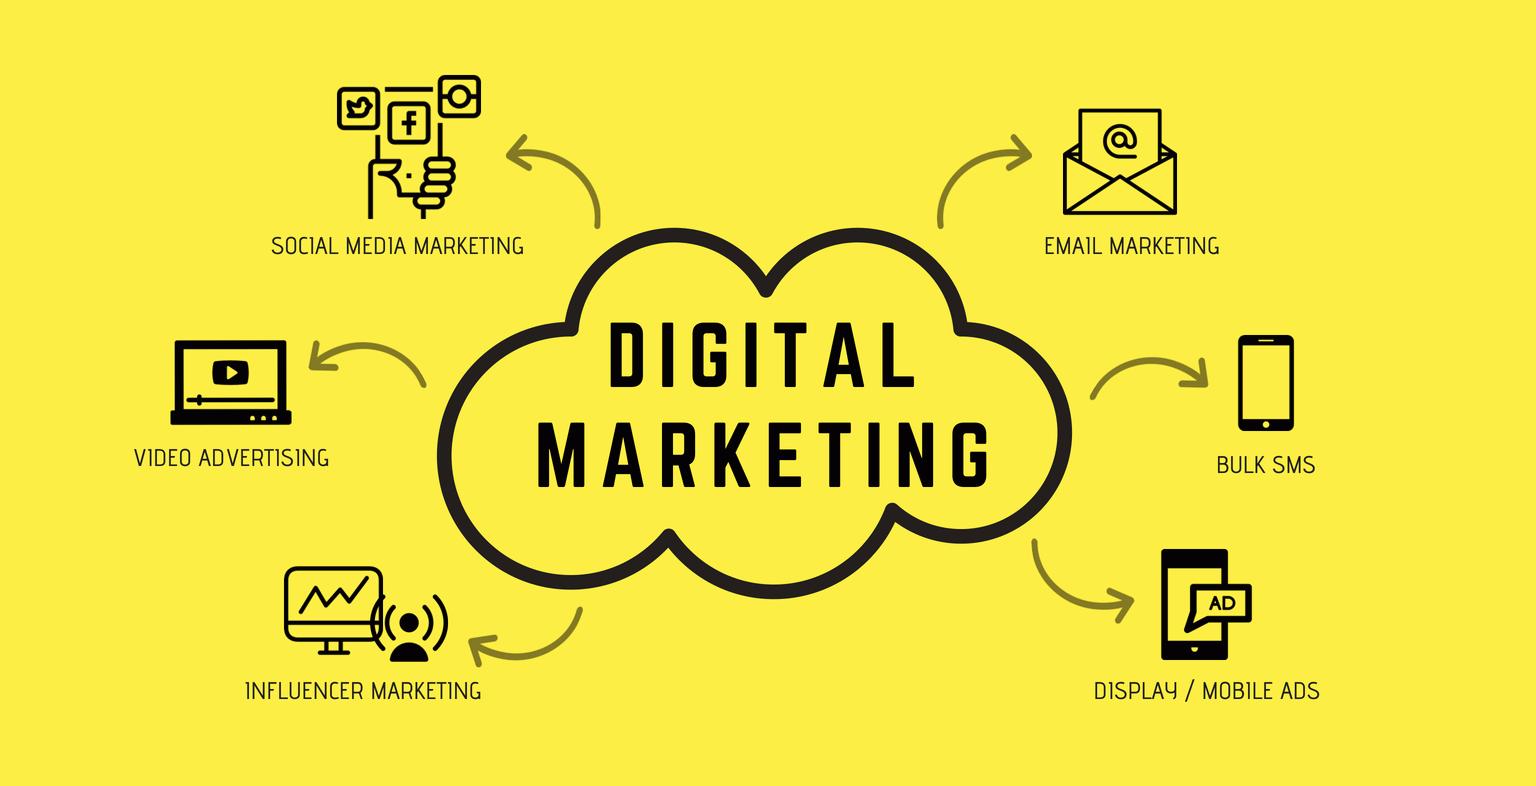 Apa itu Digital Marketing Keunggulan, Jenis dan Cara Memulai